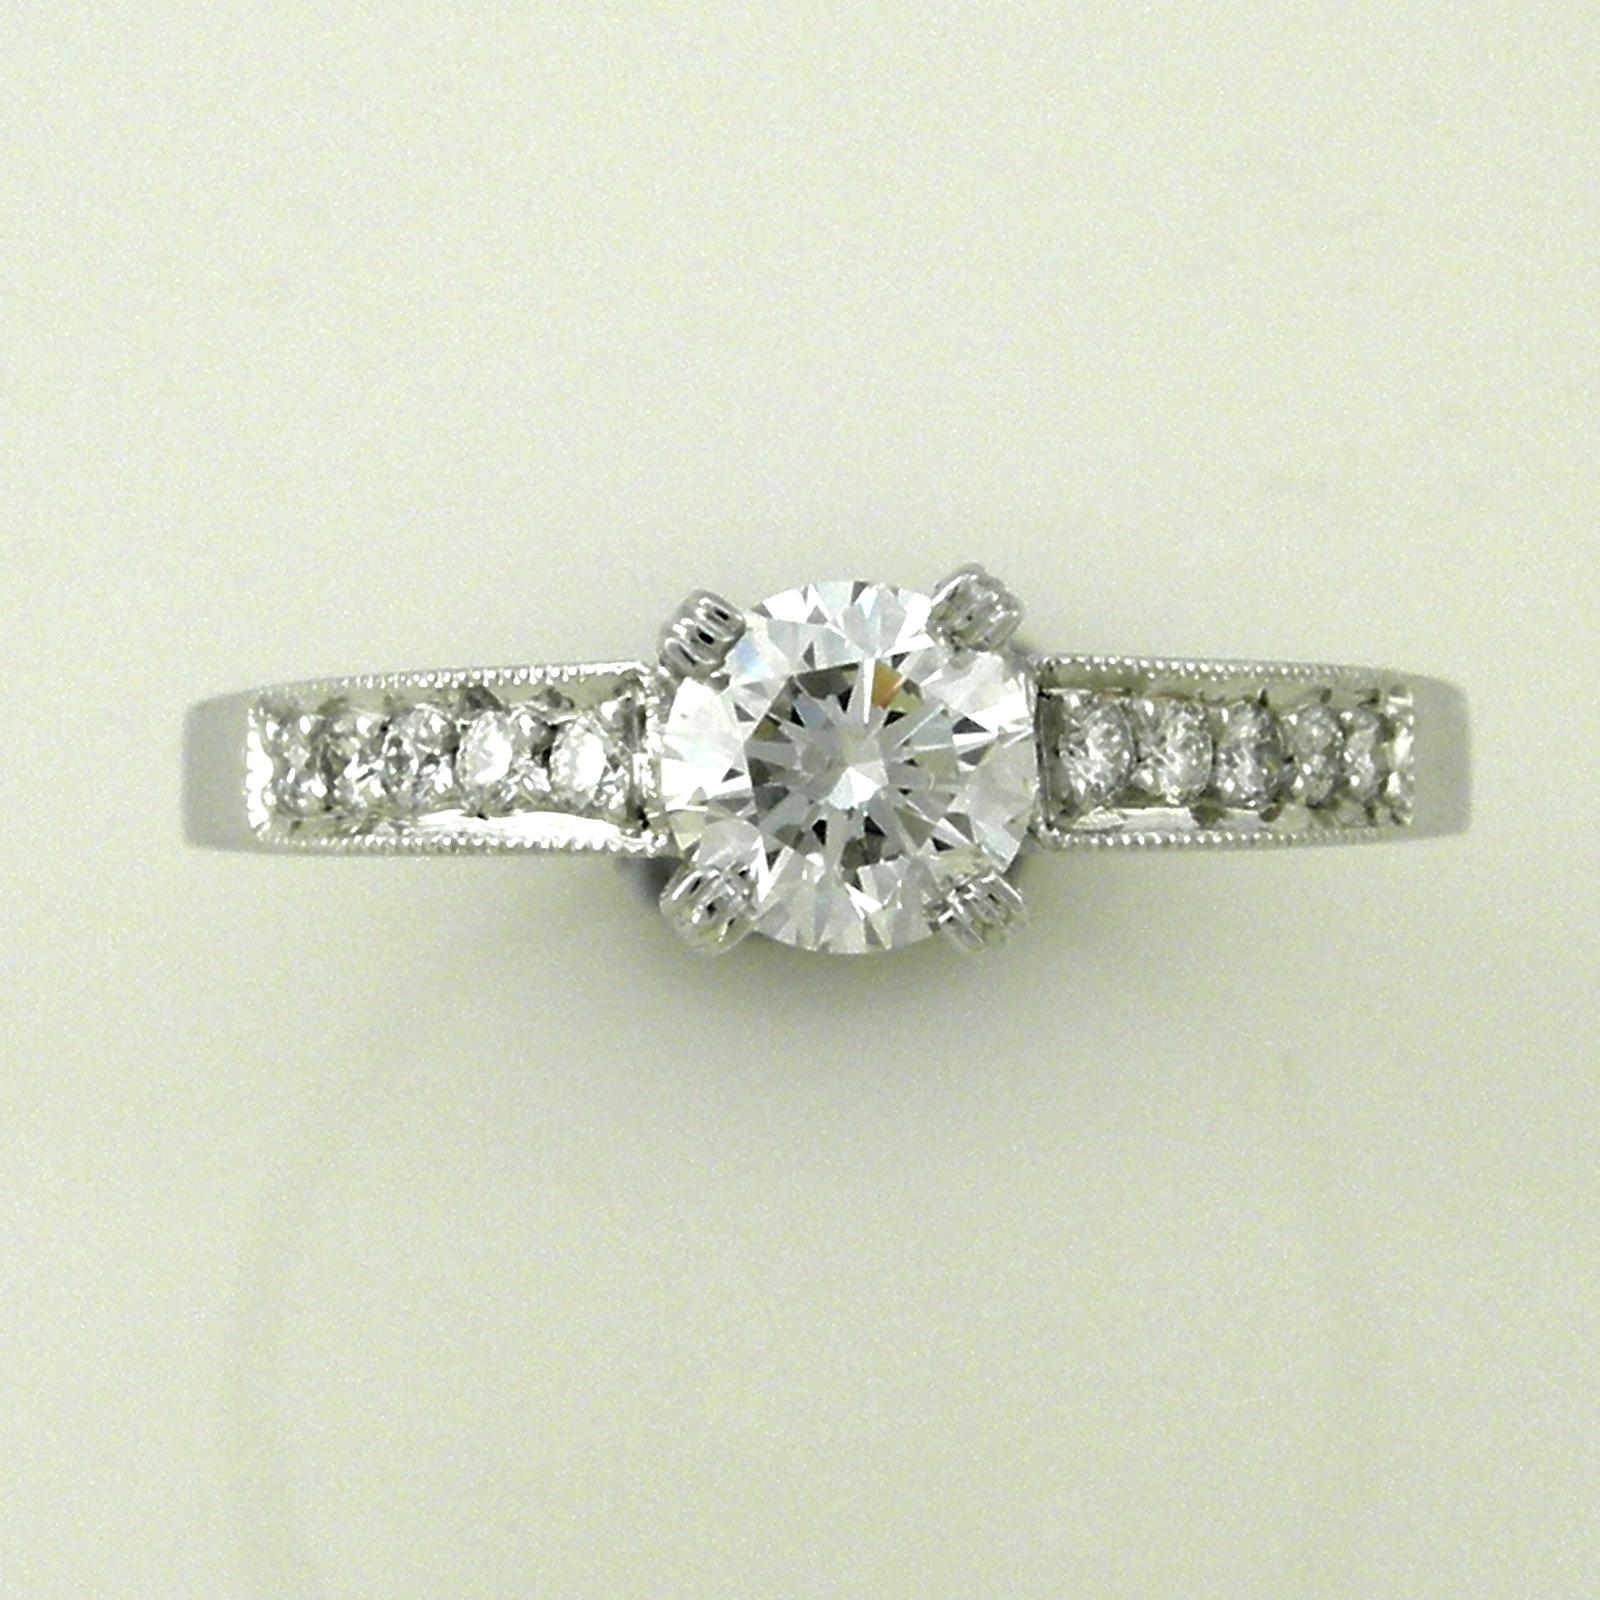 Astonishing Diamond & White Gold Engagement Ring 5